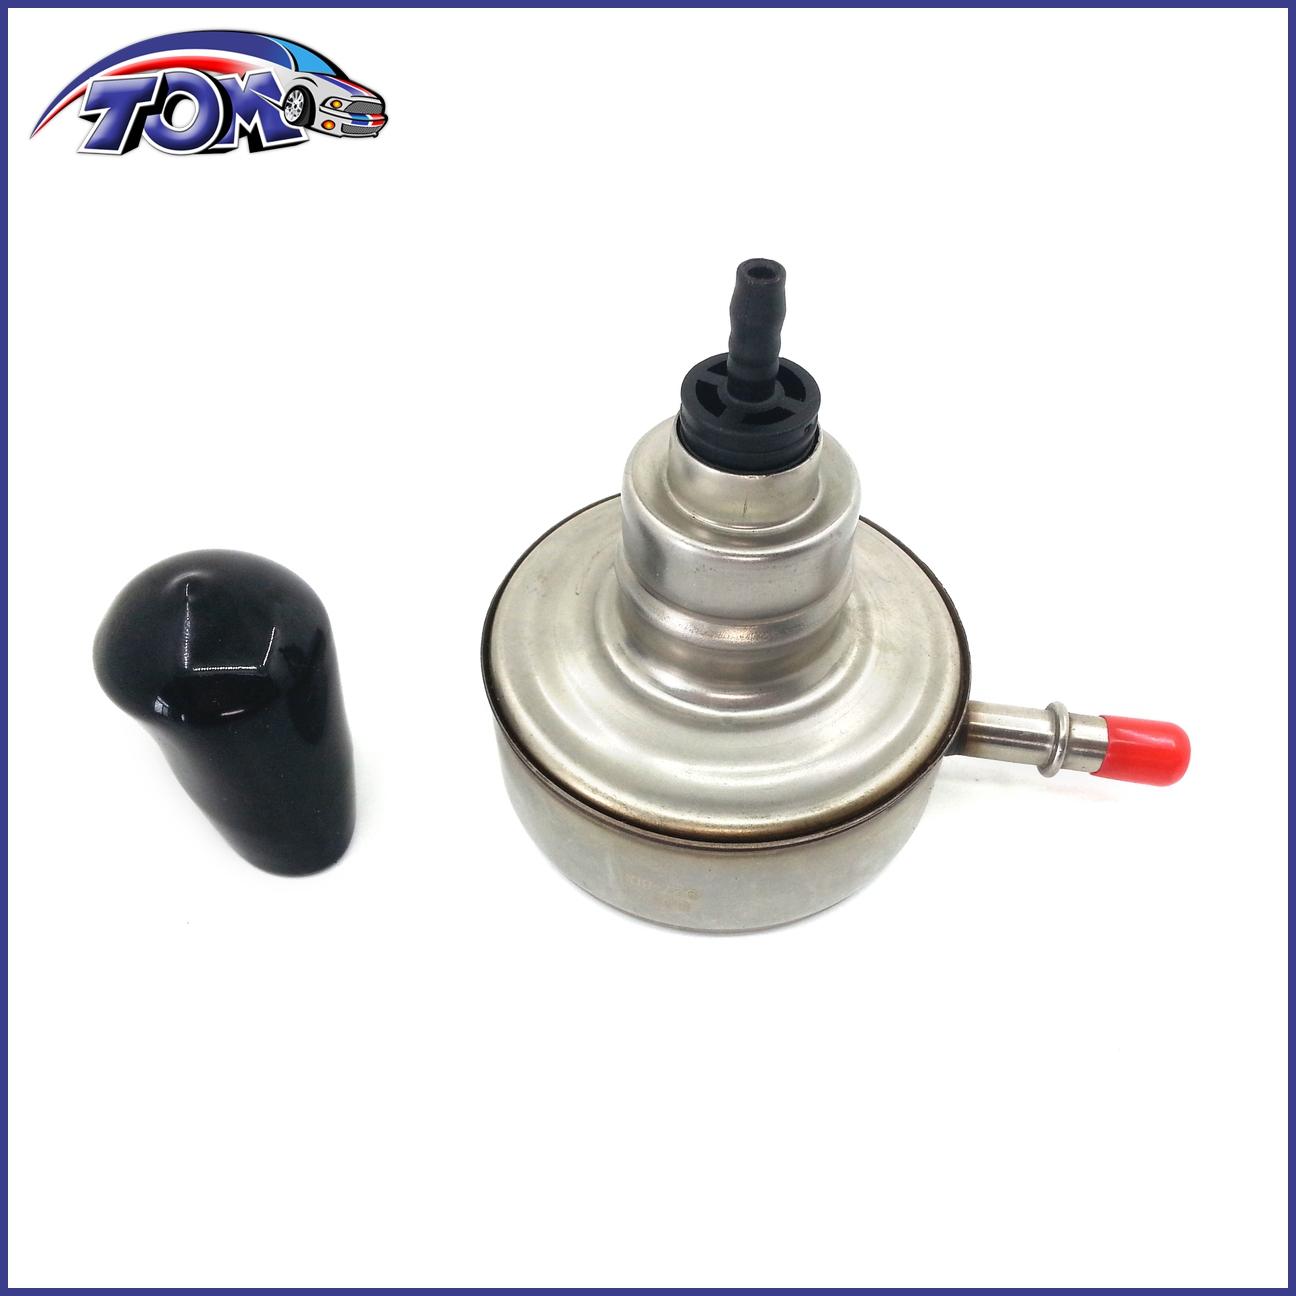 1994 Dodge Dakota Fuel Filter Brand New Pressure Regulator Ab Ebay 1296x1296